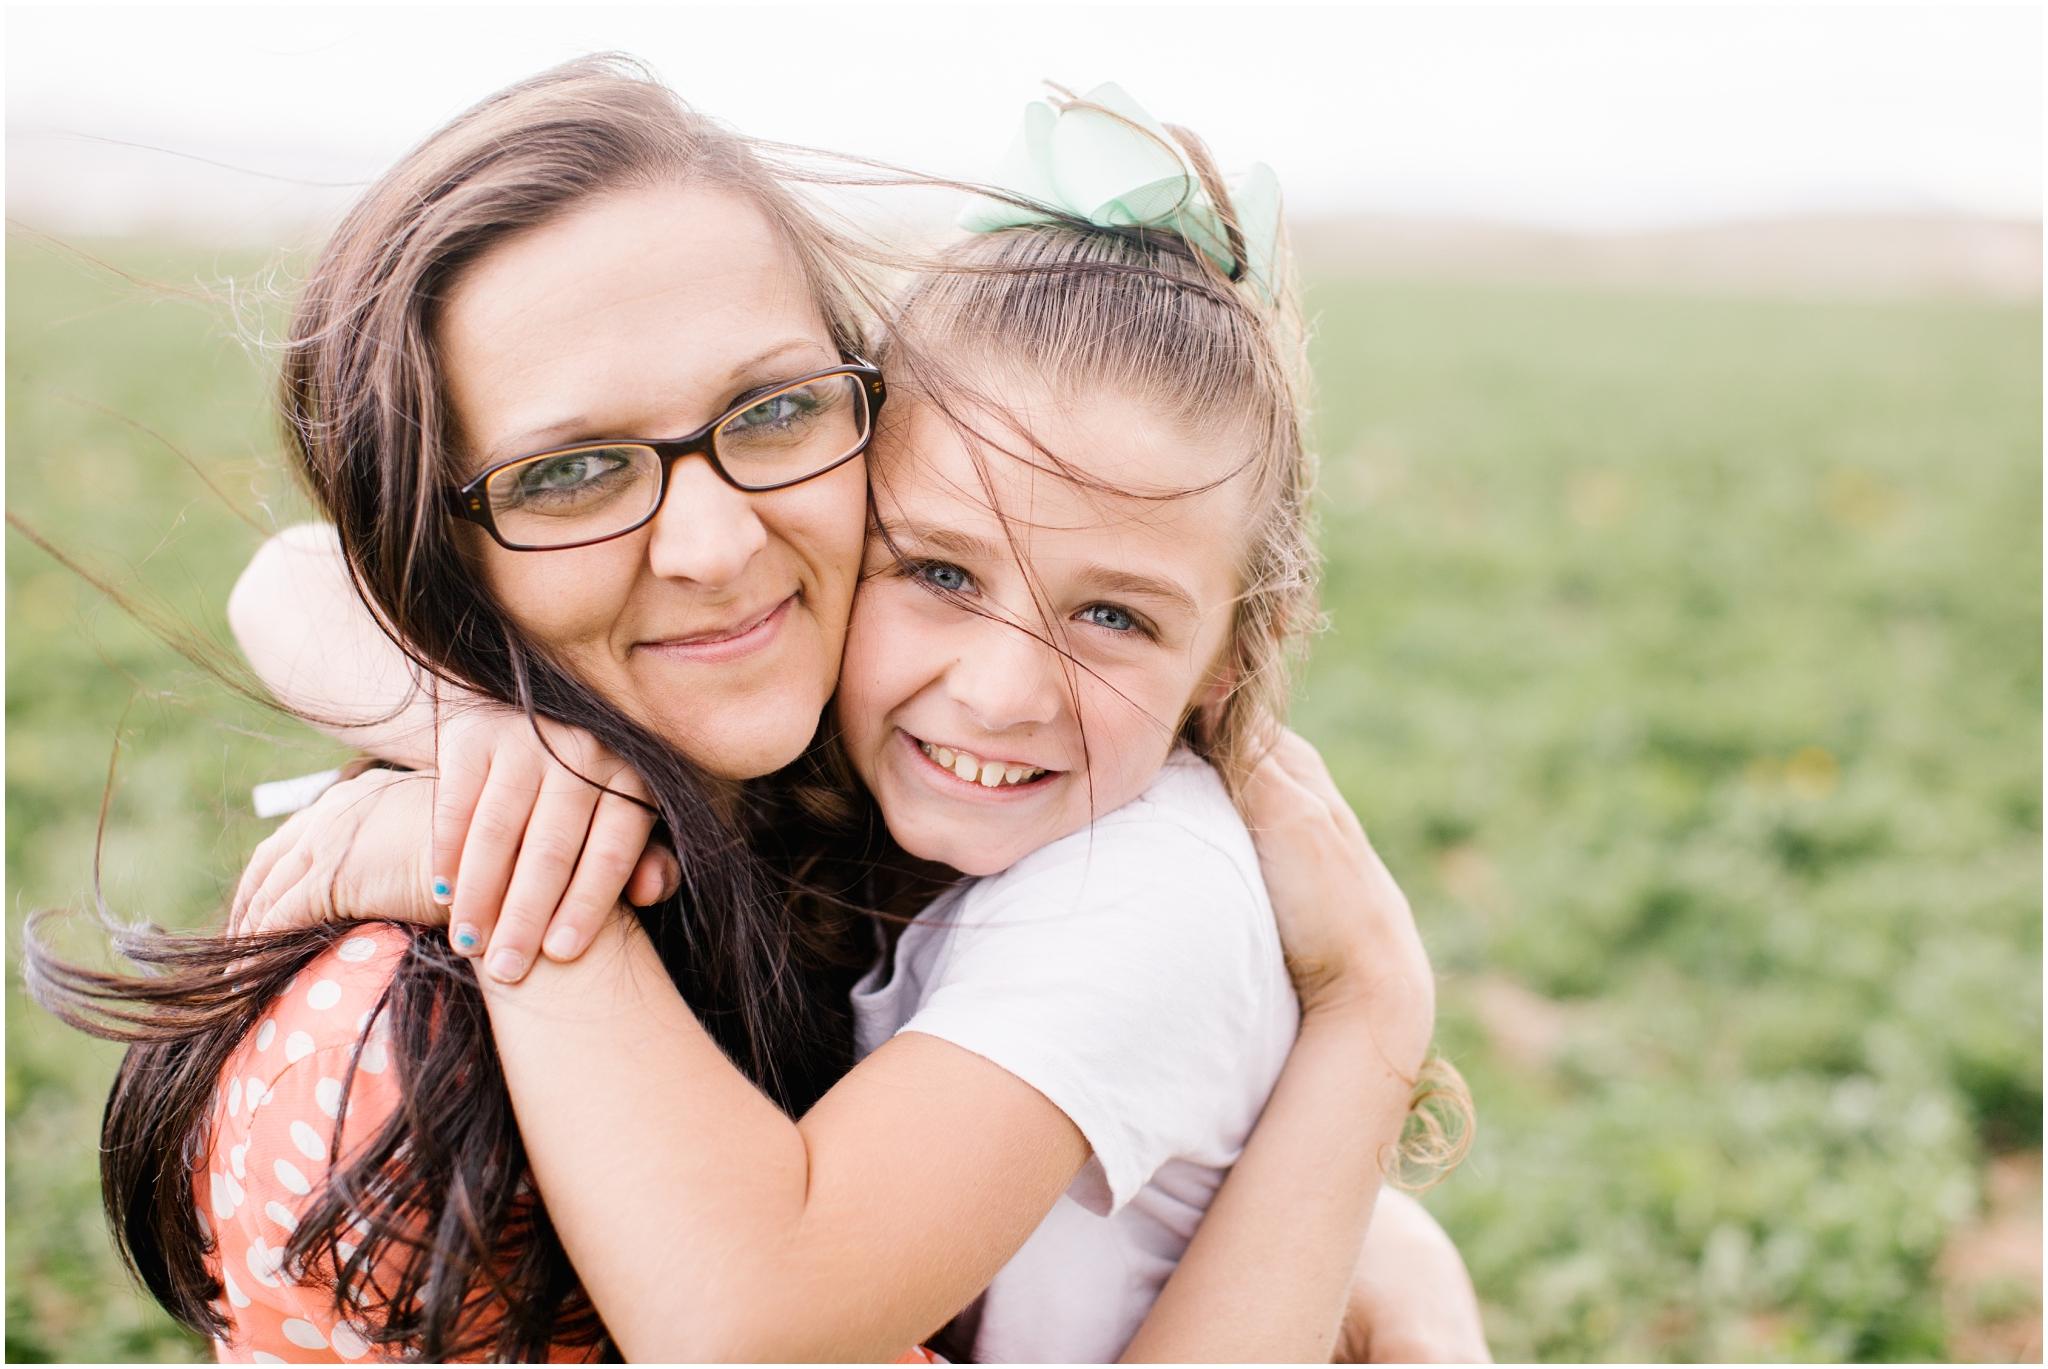 Conner-61_Lizzie-B-Imagery-Utah-Family-Photographer-Salt-Lake-City-Park-City-Utah-County.jpg